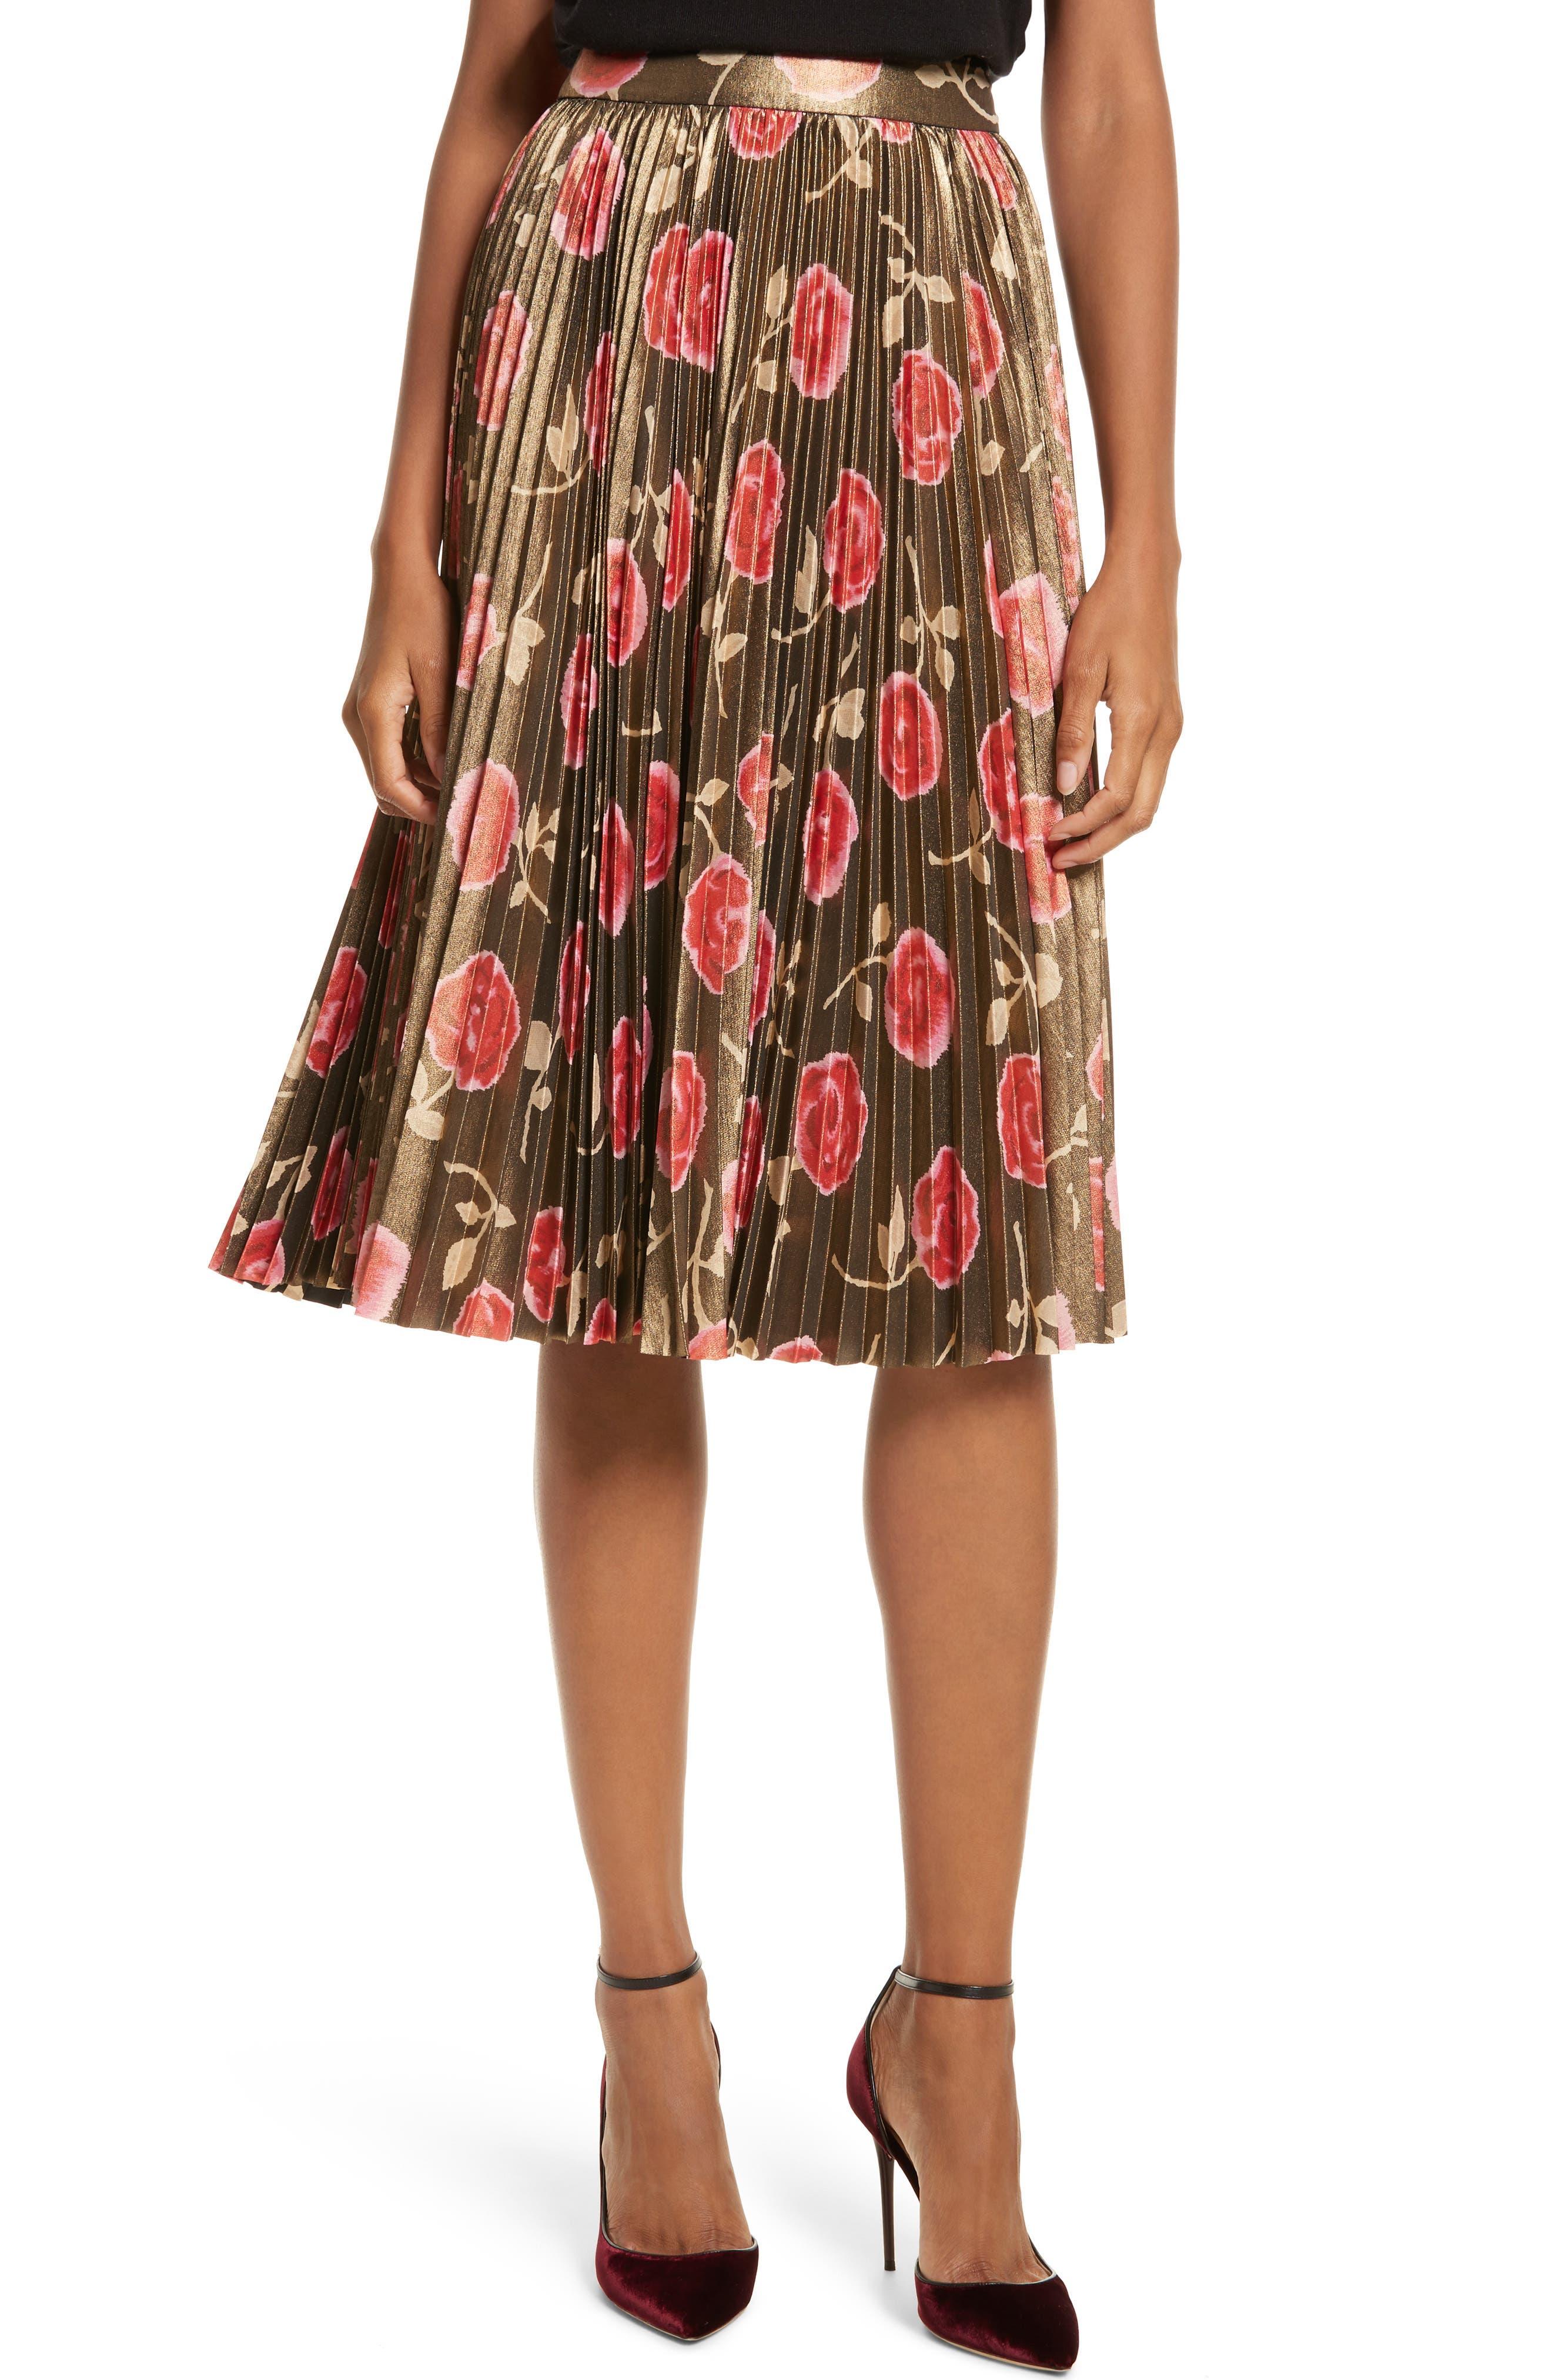 kate spade new york hazy rose pleated metallic skirt